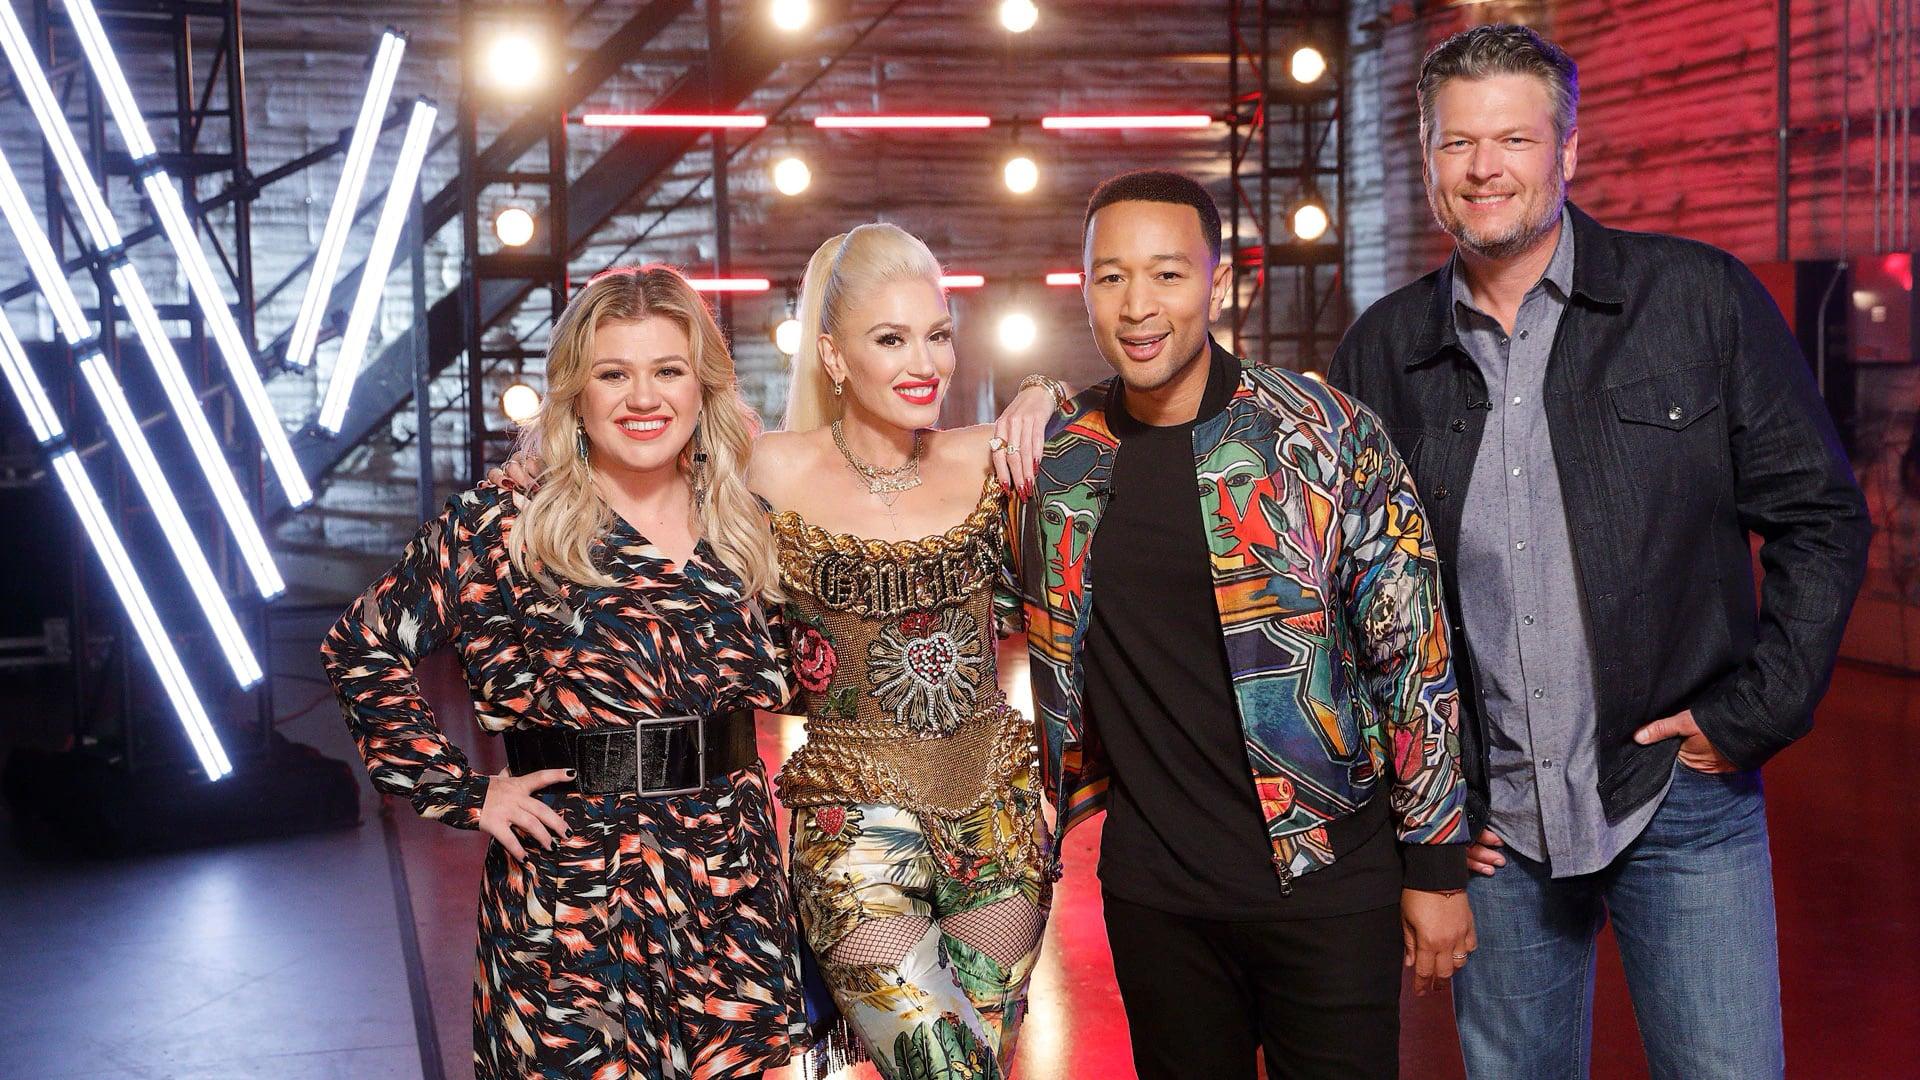 The Voice - Season 17 Episode 1 : The Blind Auditions Season Premiere